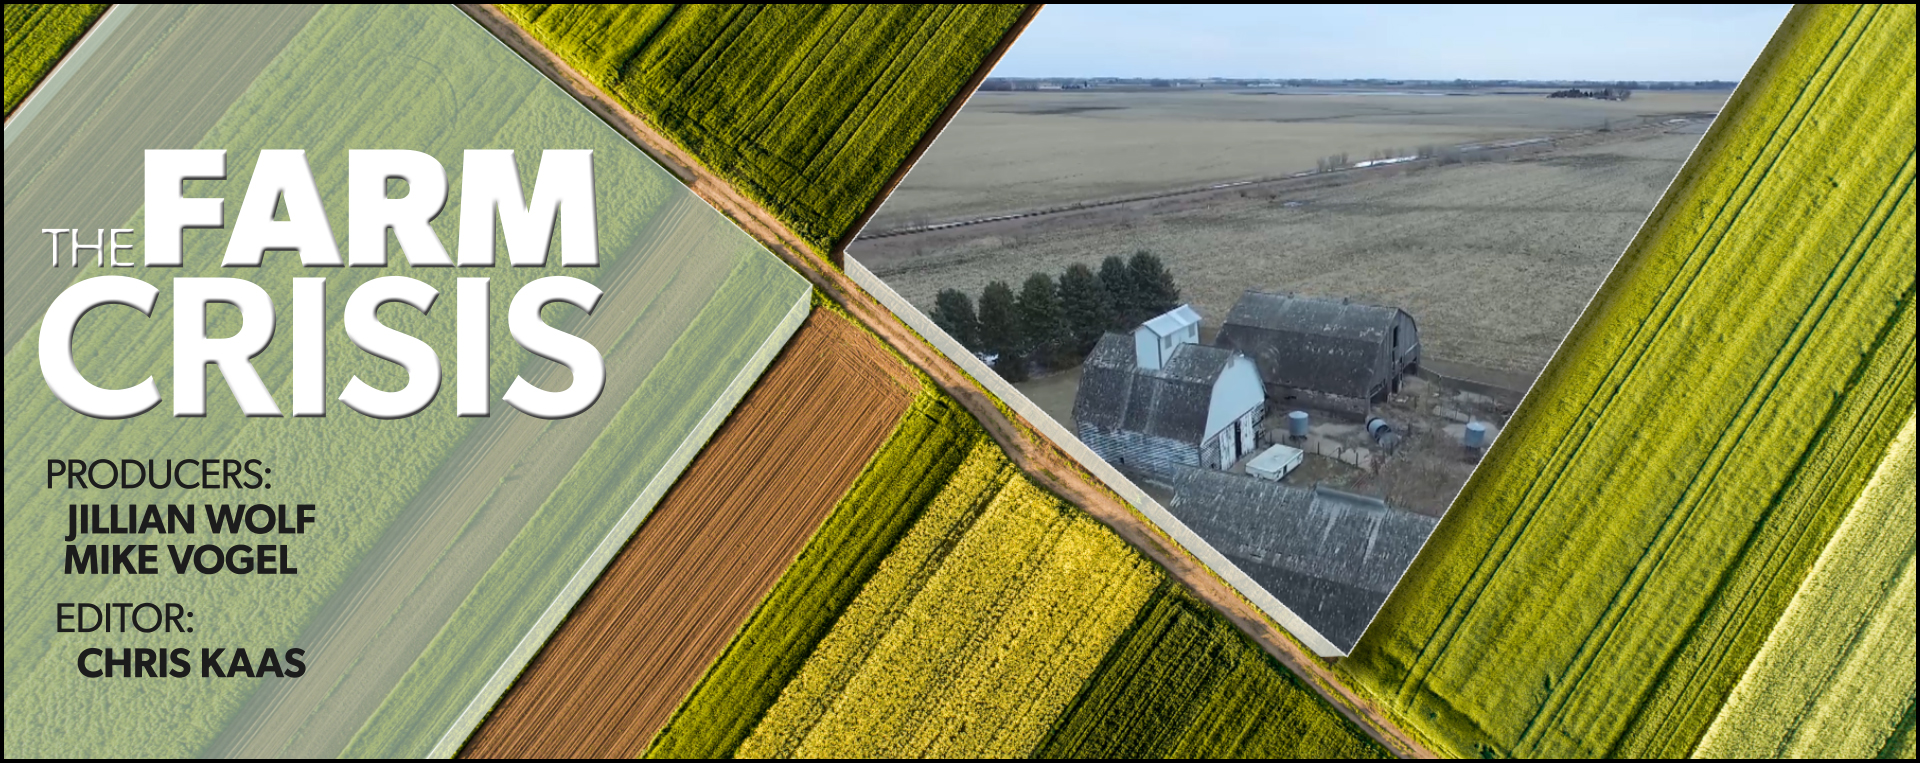 THE-FARM-CRISIS-SPOTLIGHT.jpg